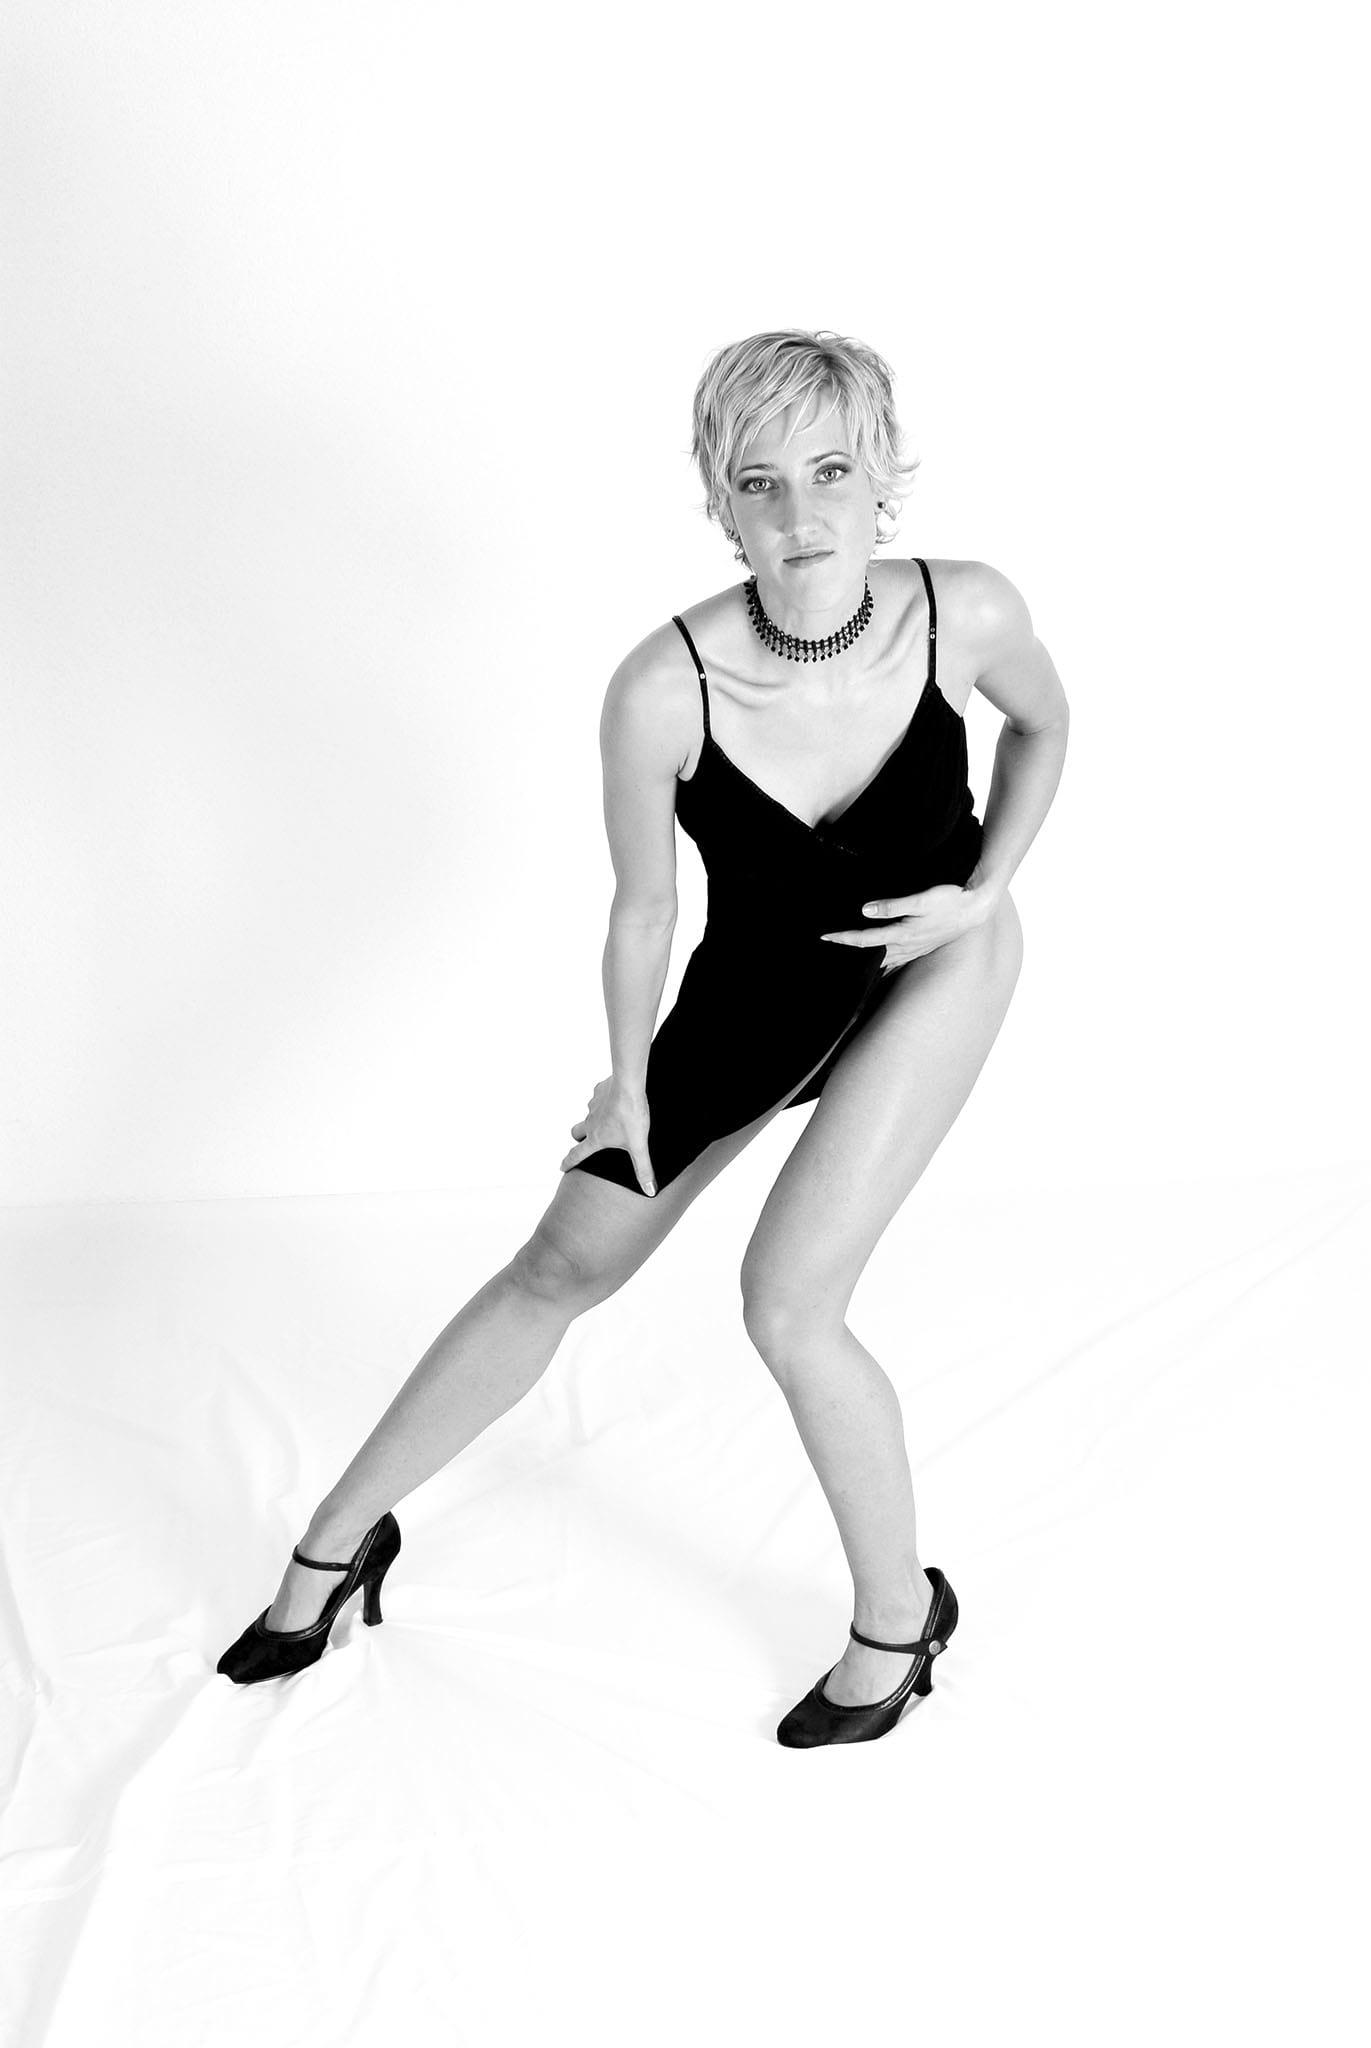 Akt 13 - Akt Nude Act Aktfotografie Erotik Erotic